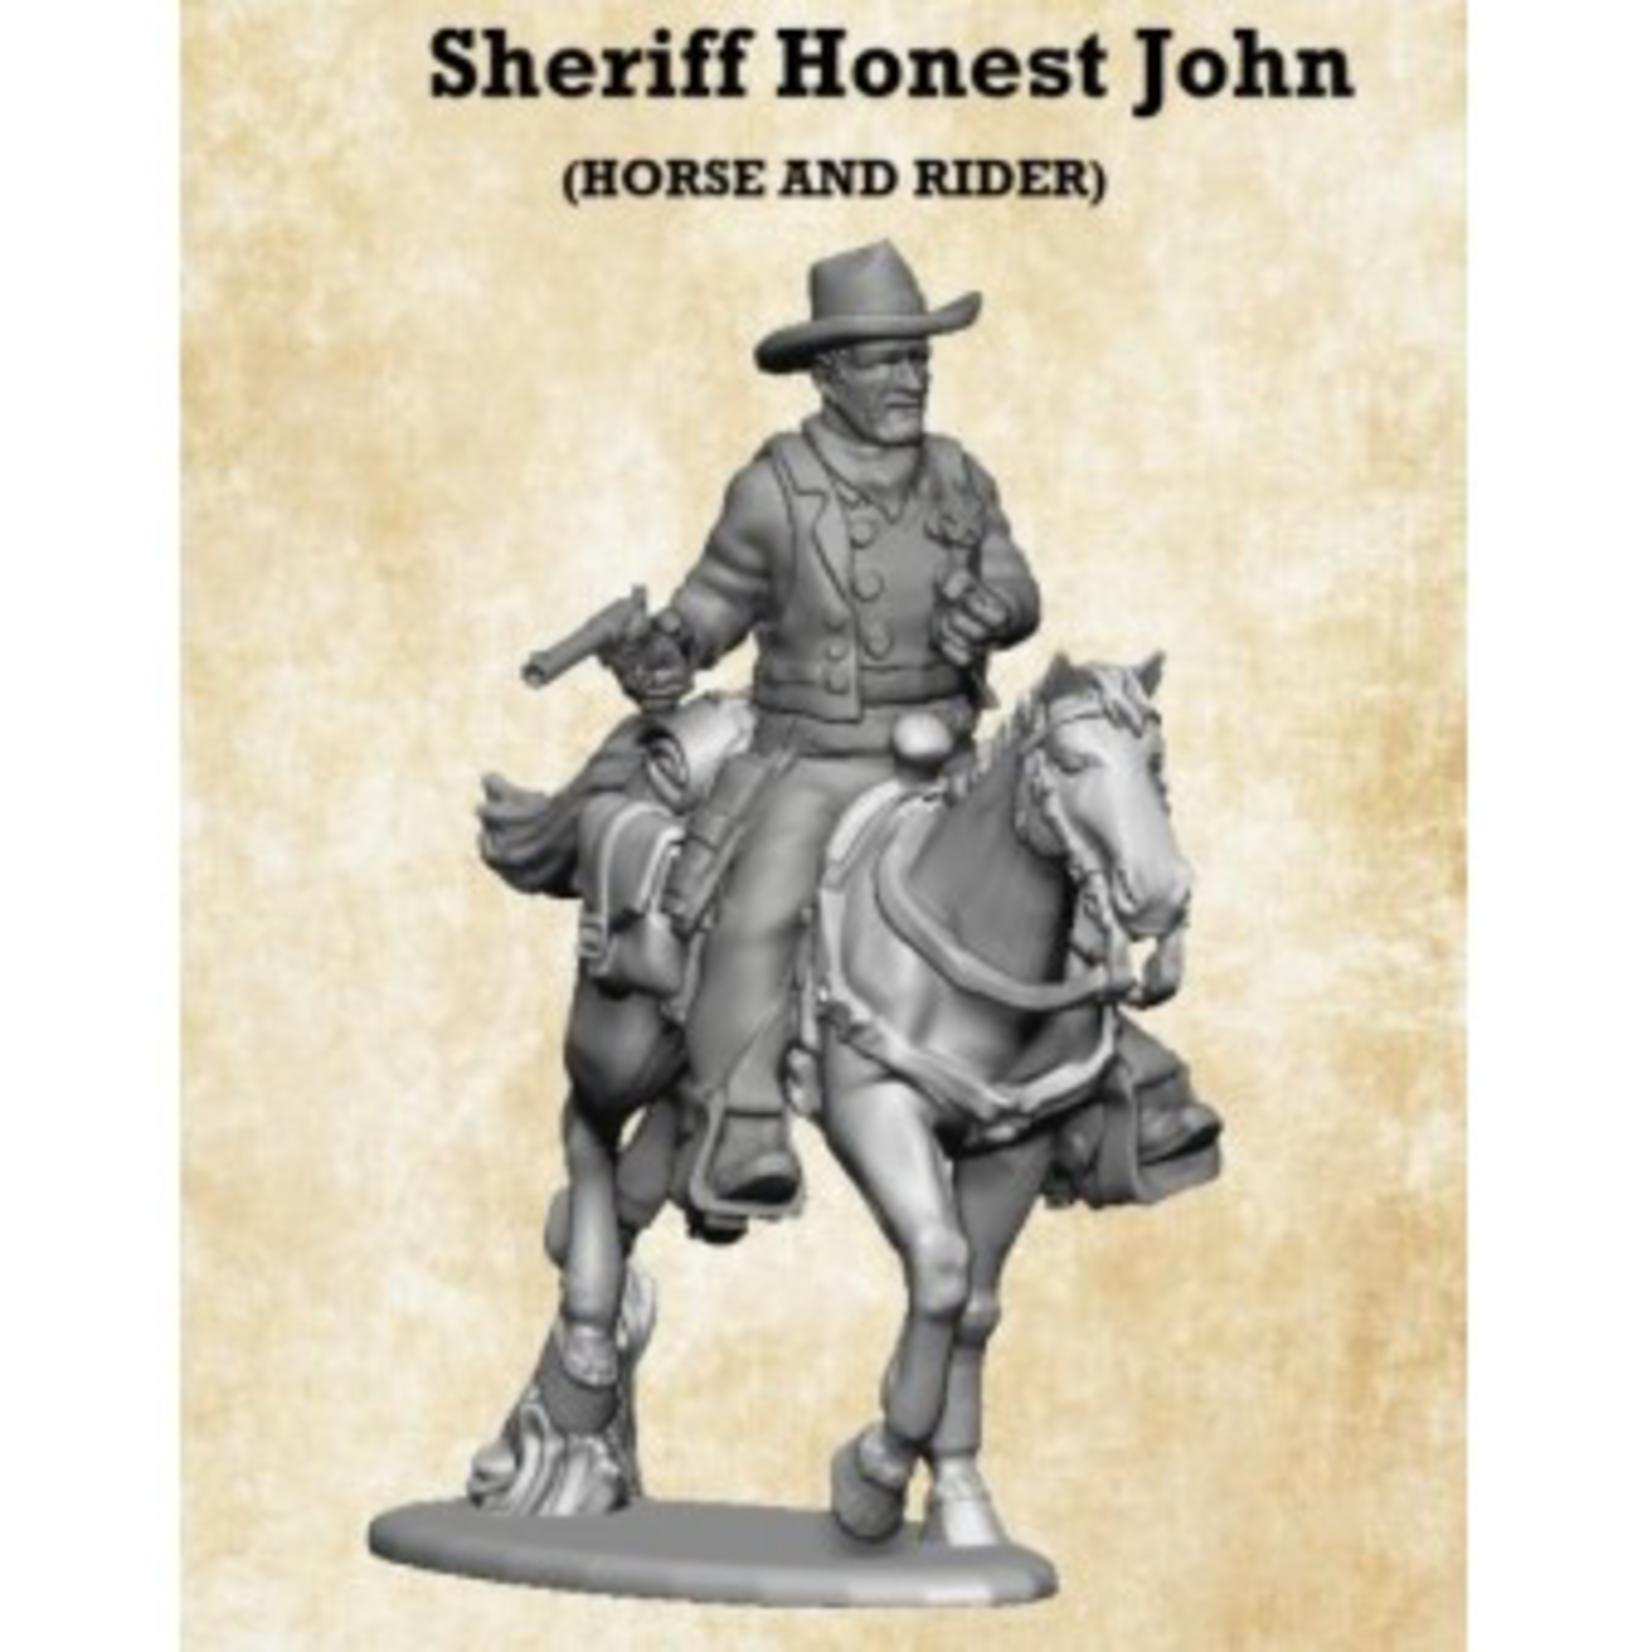 Honest John Mounted